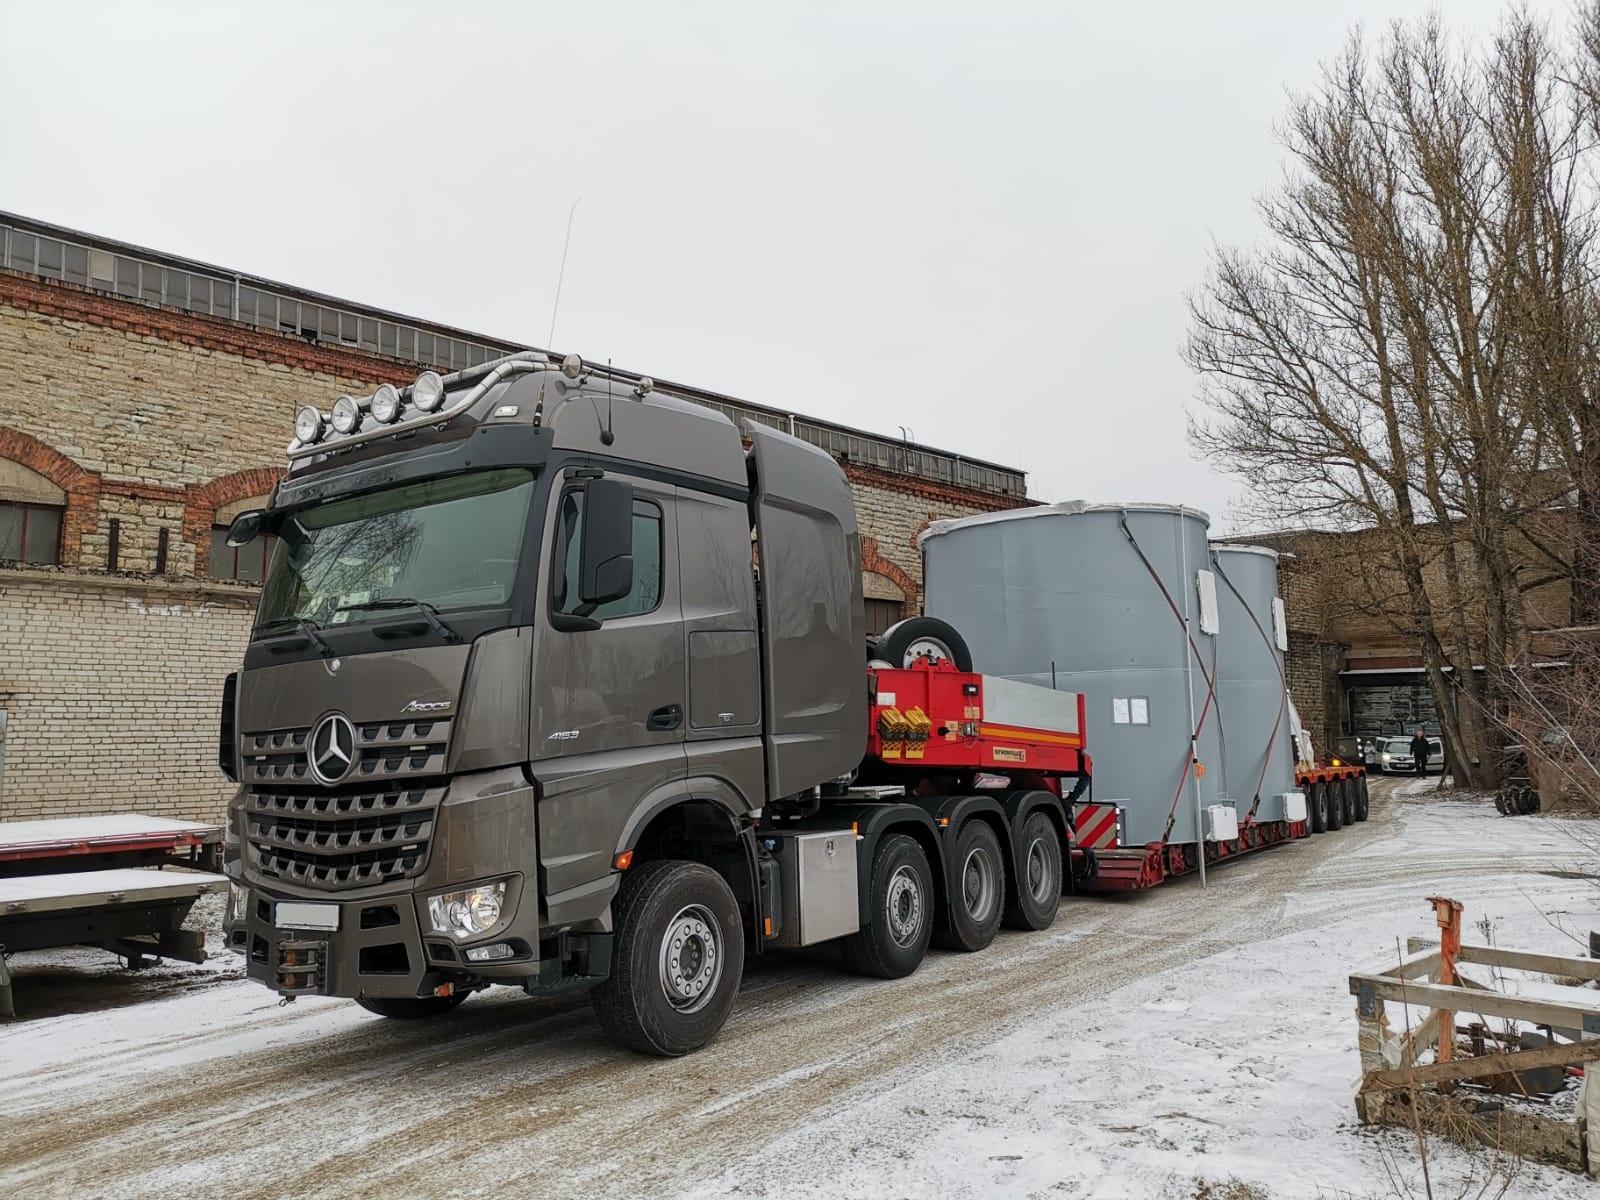 transport piese agabaritice